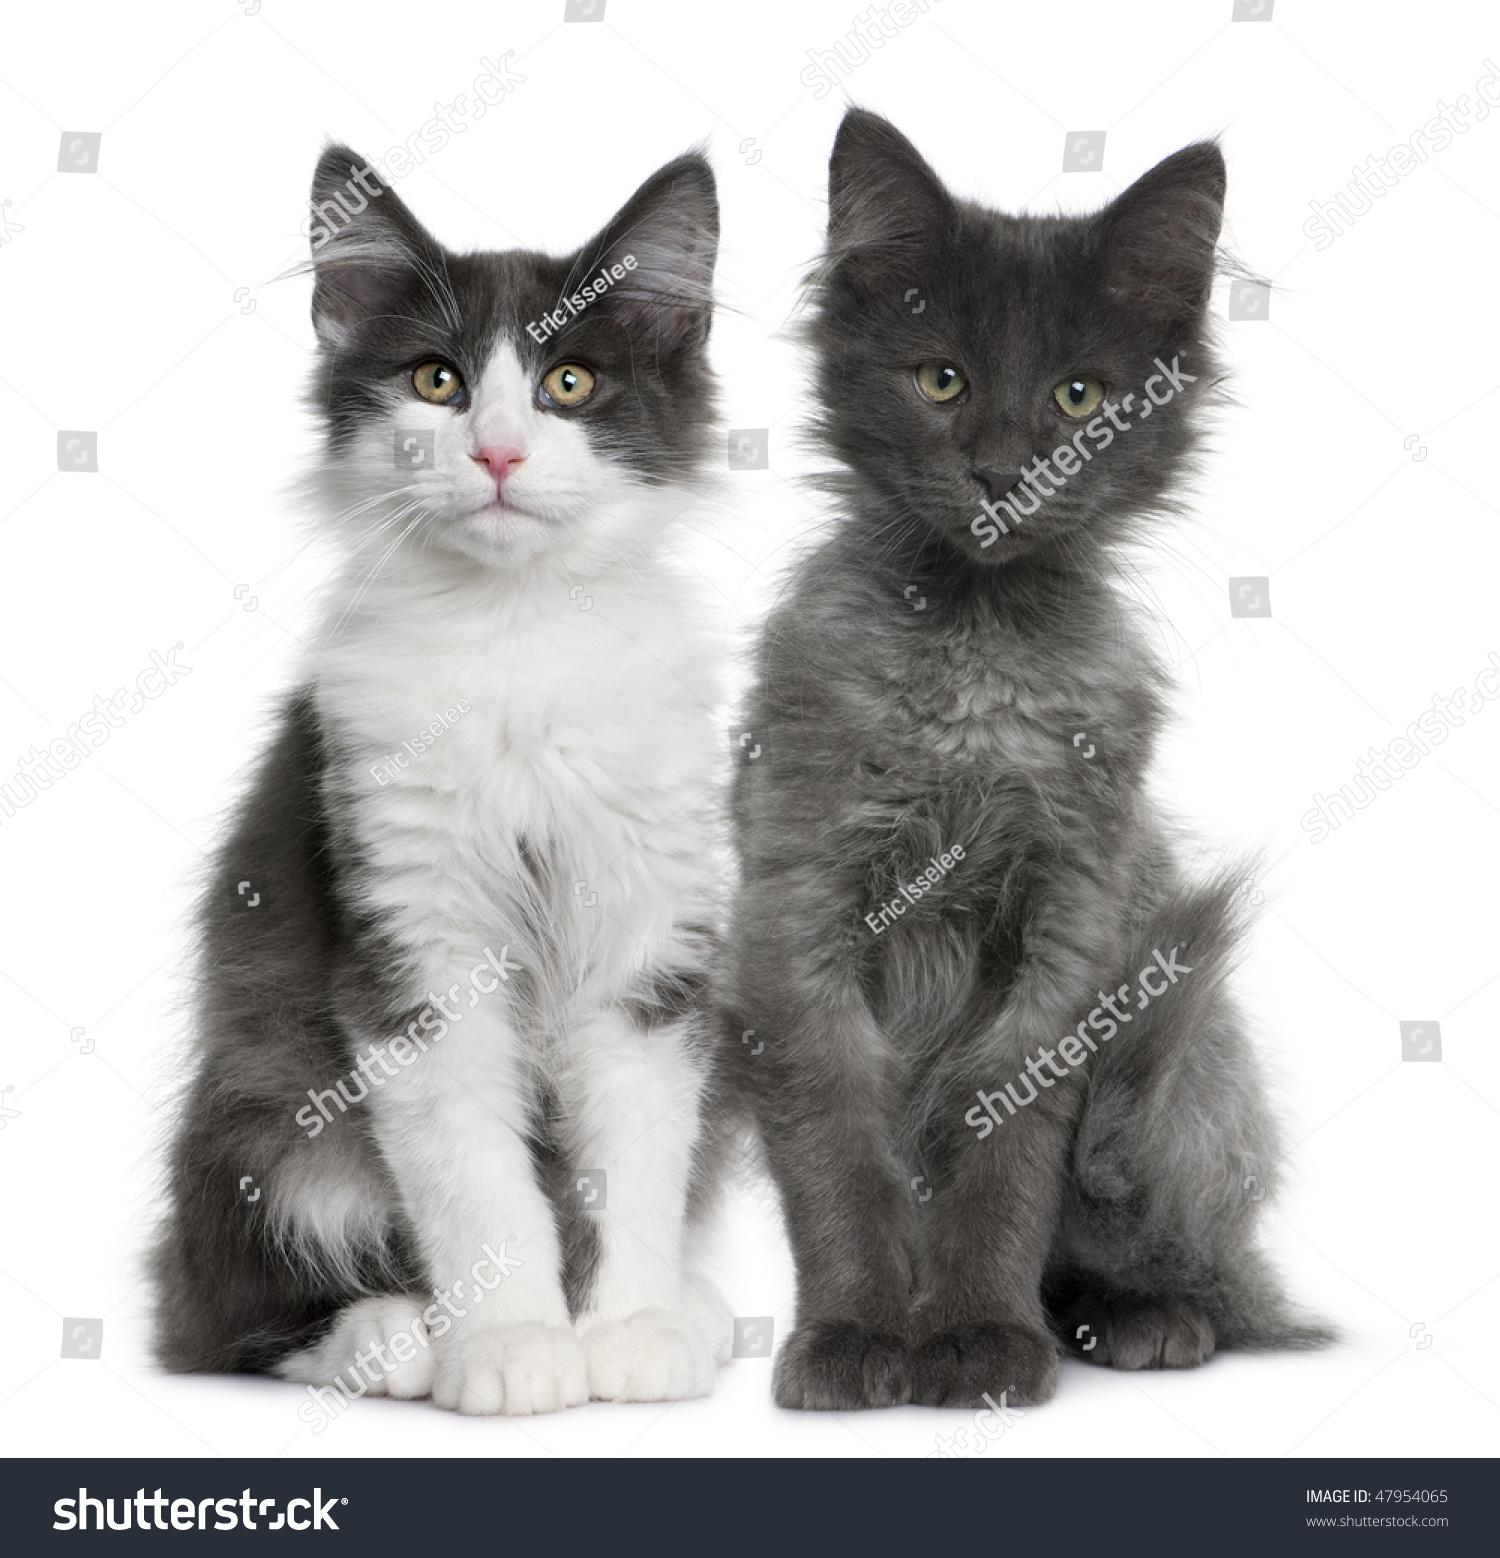 dansk pornofilm cat people oslo